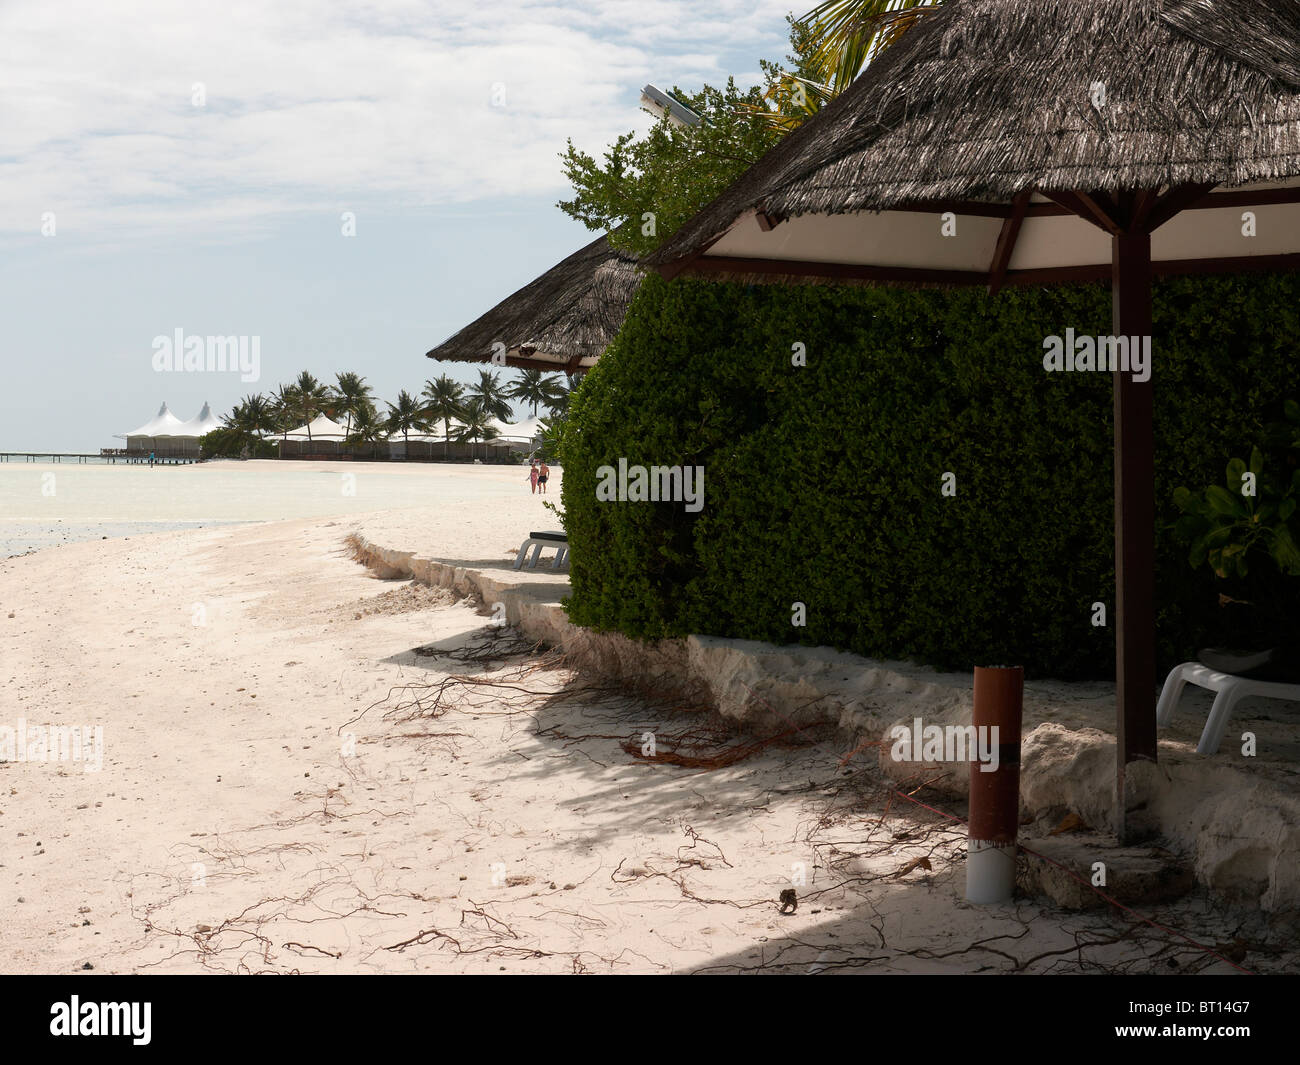 Erosion on Maldivian island, showing signs of rising sea levels Stock Photo